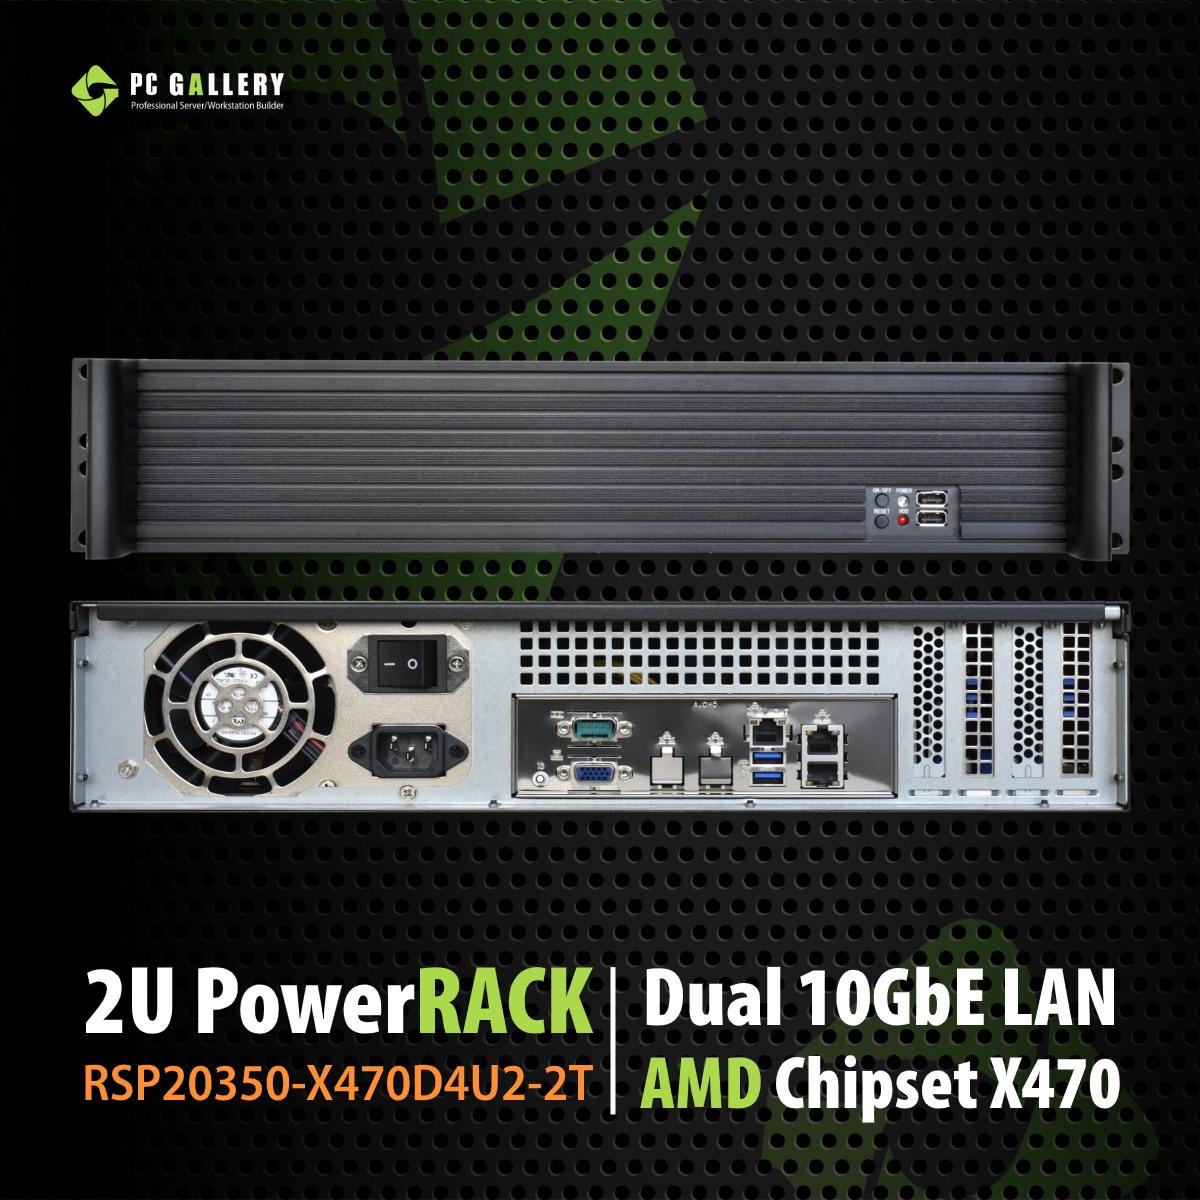 RSP20350-X470D4U2-2T